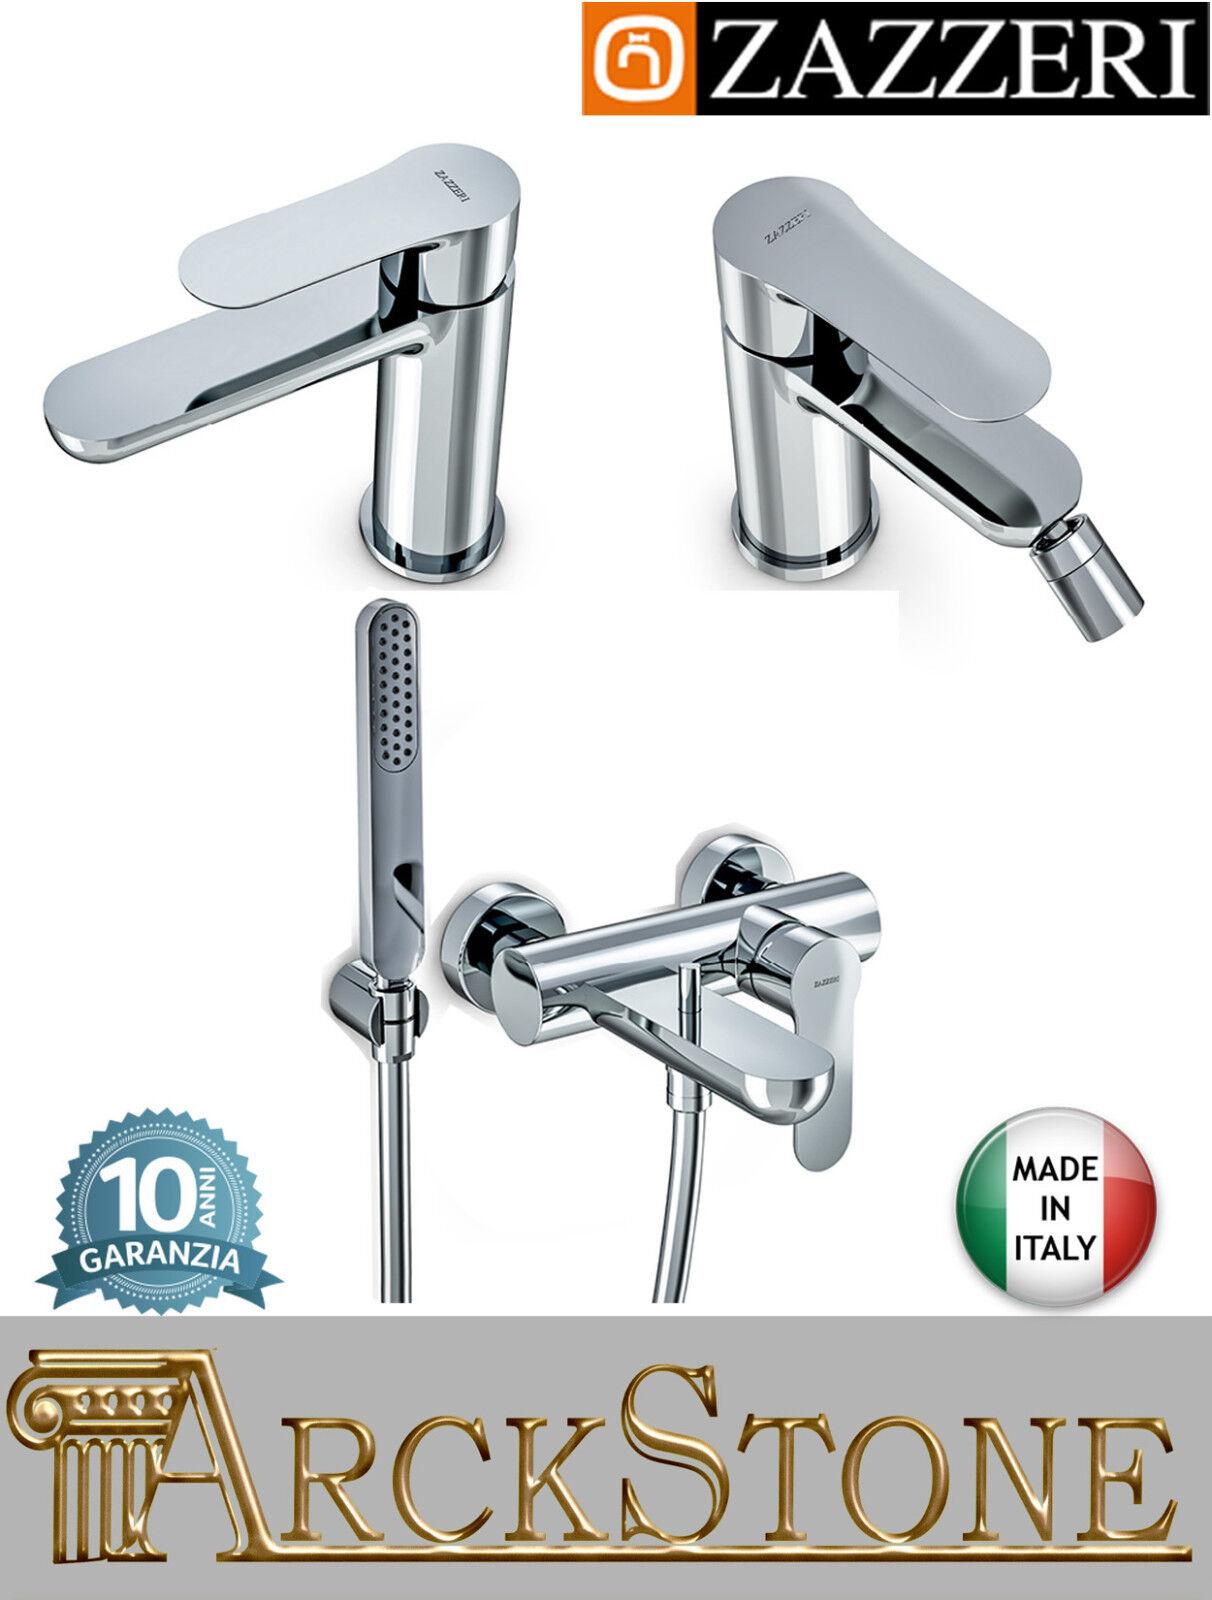 Rubinetteria completa Zazzeri Ultra mix lavabo bidet vasca doccetta flessibile